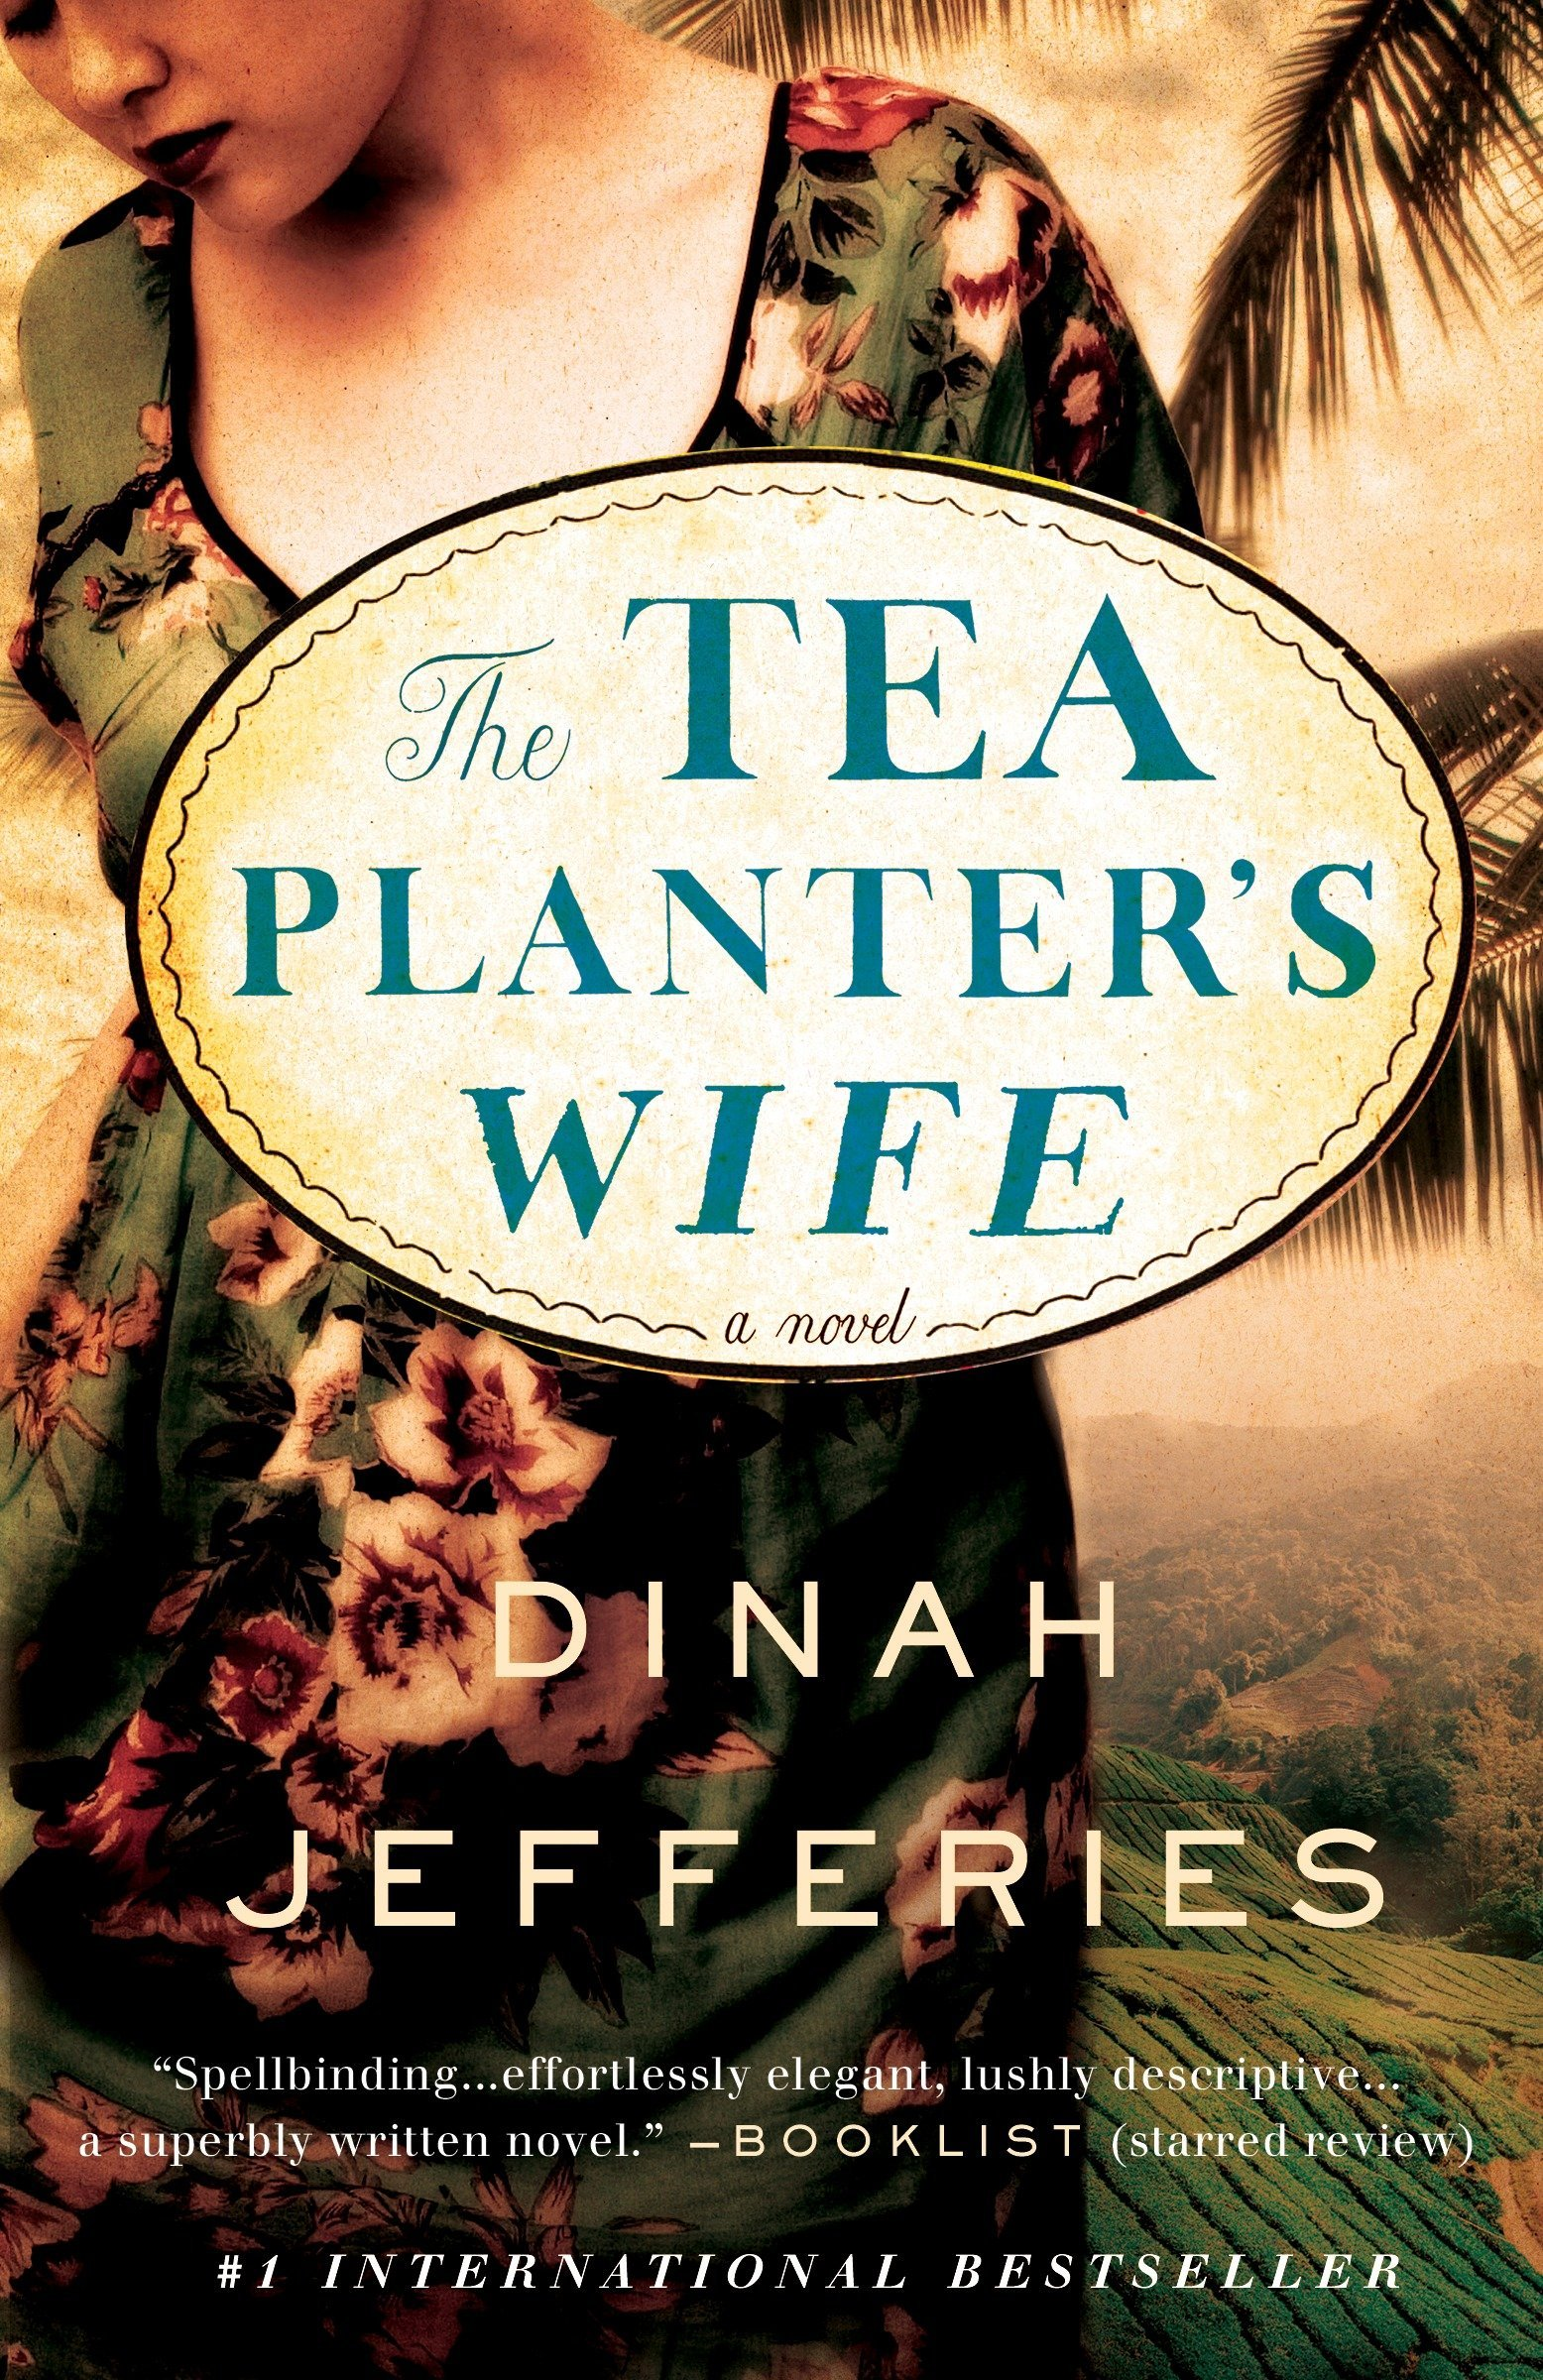 The Tea Planter's Wife: A Novel pdf